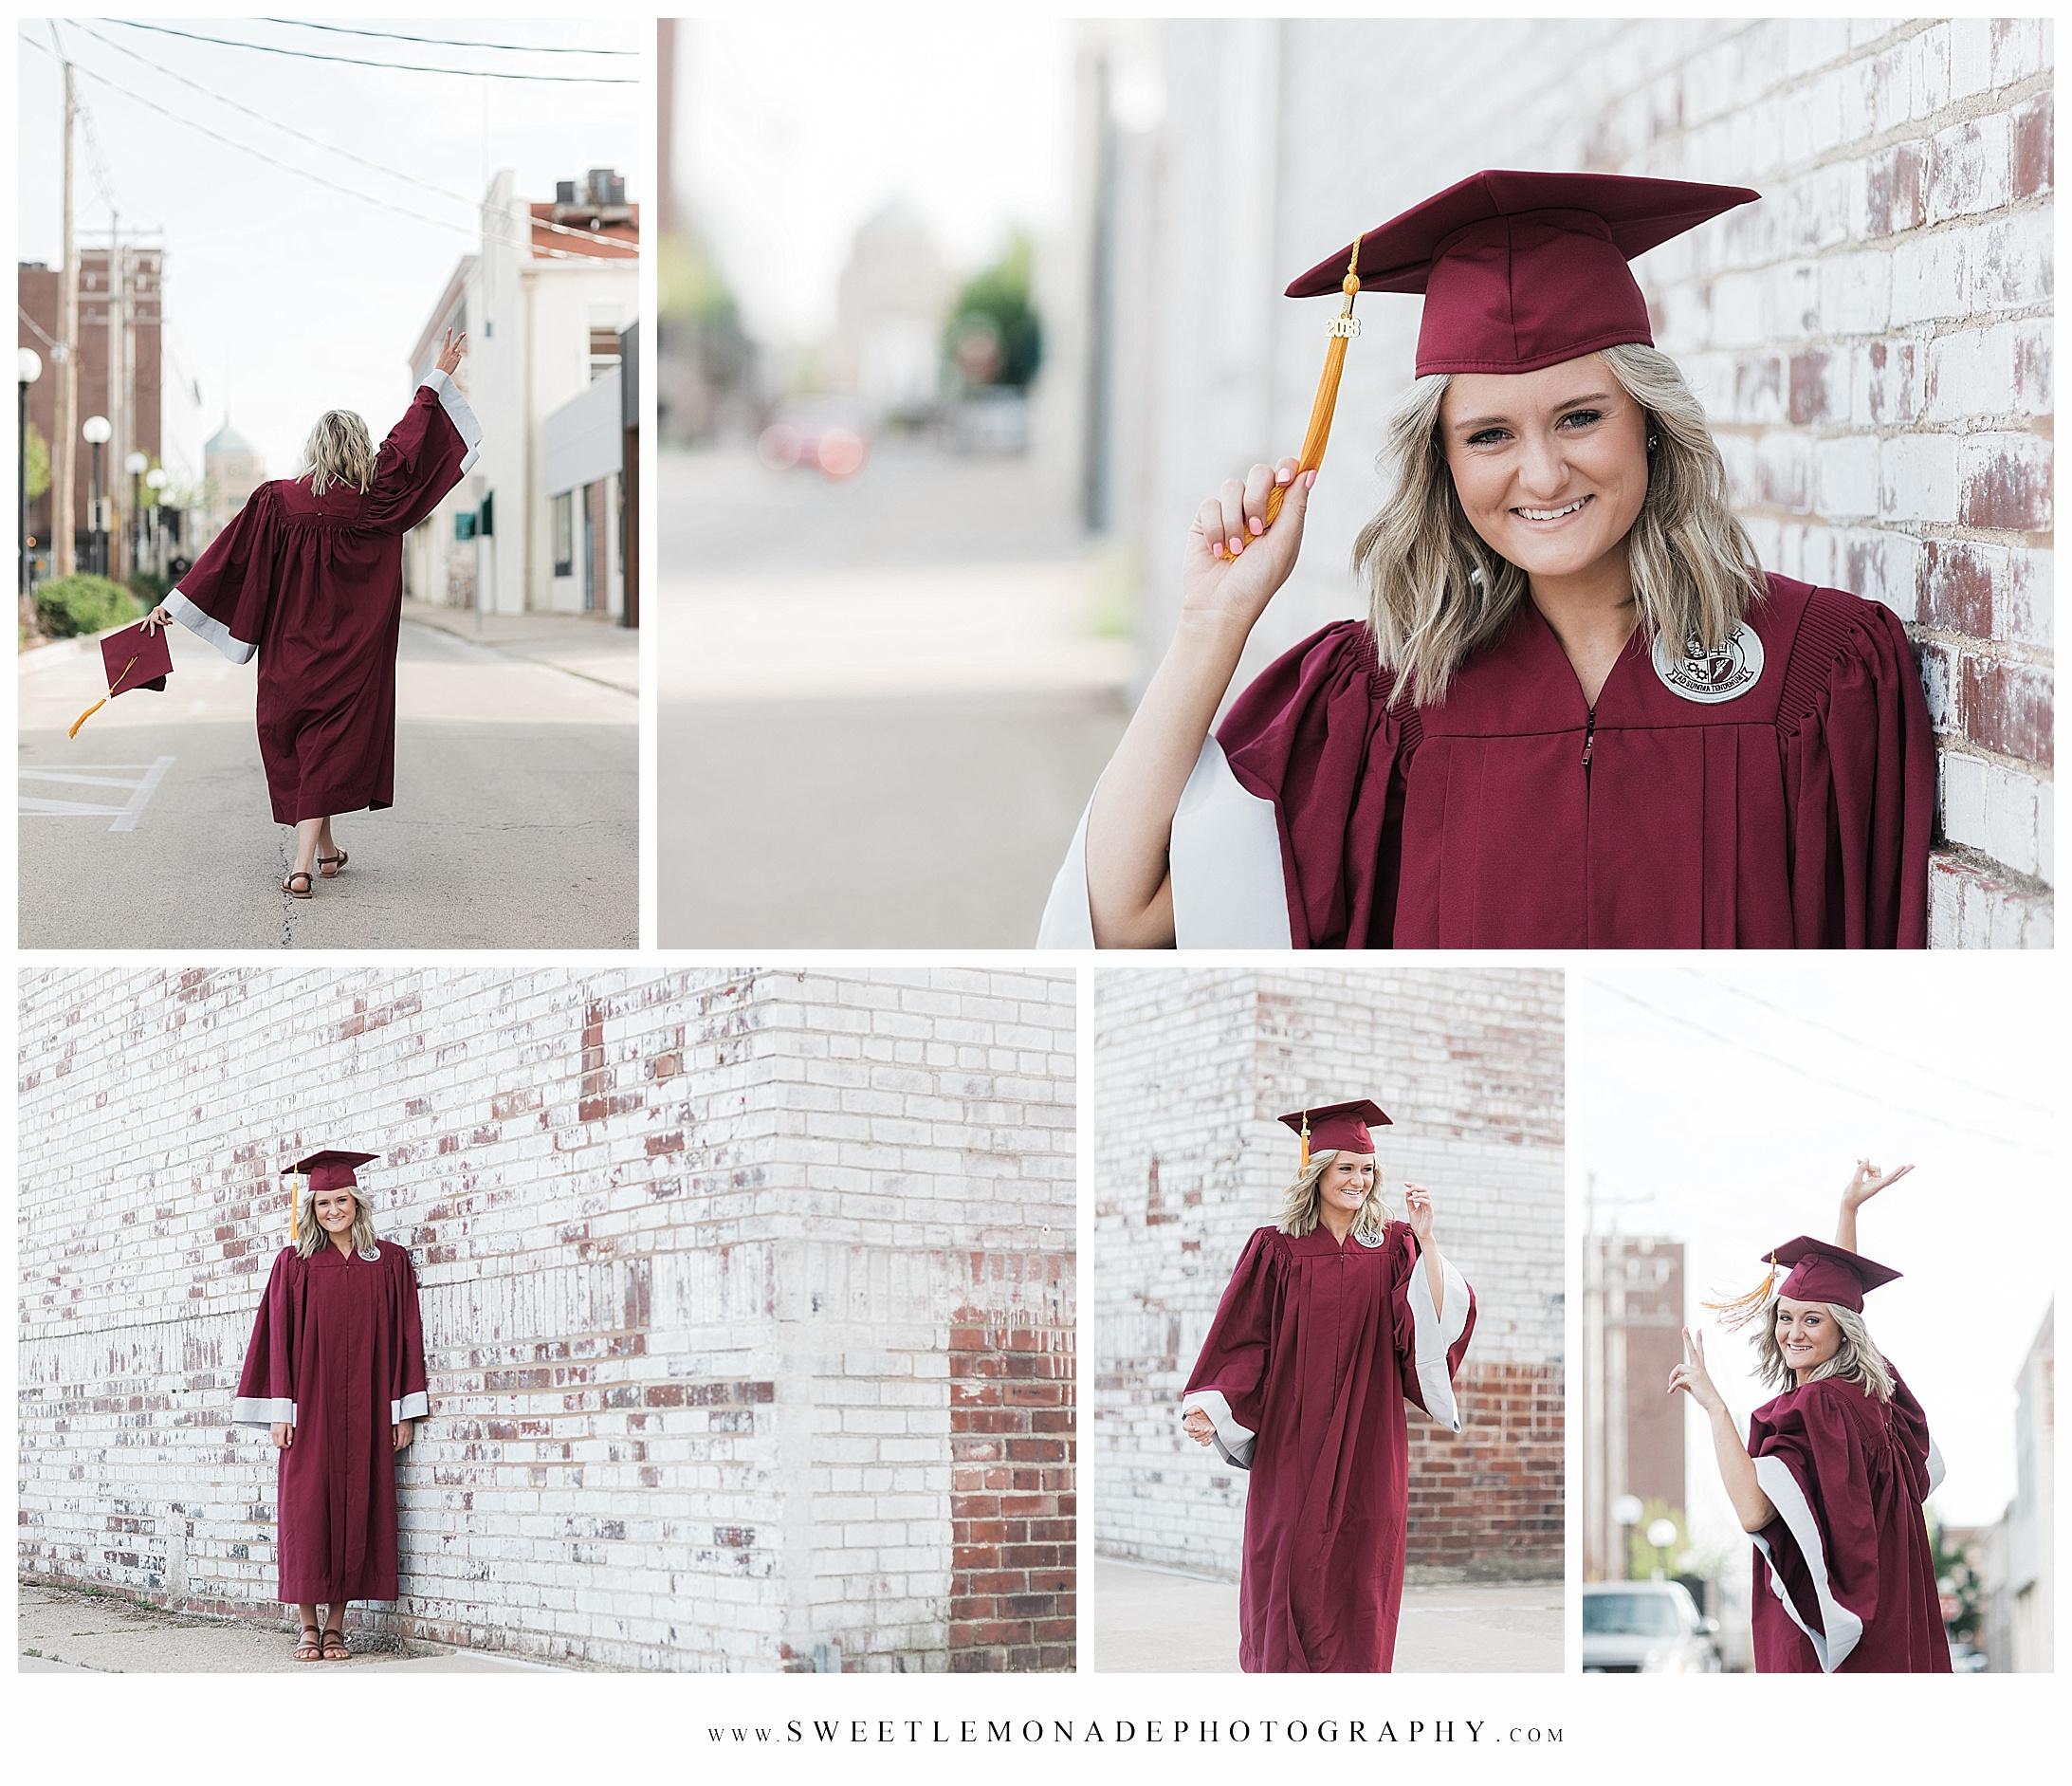 champaign-illinois-unity-rockets-high-school-graduation-tolono-senior-photographer-sweet-lemonade-photography_2073.jpg